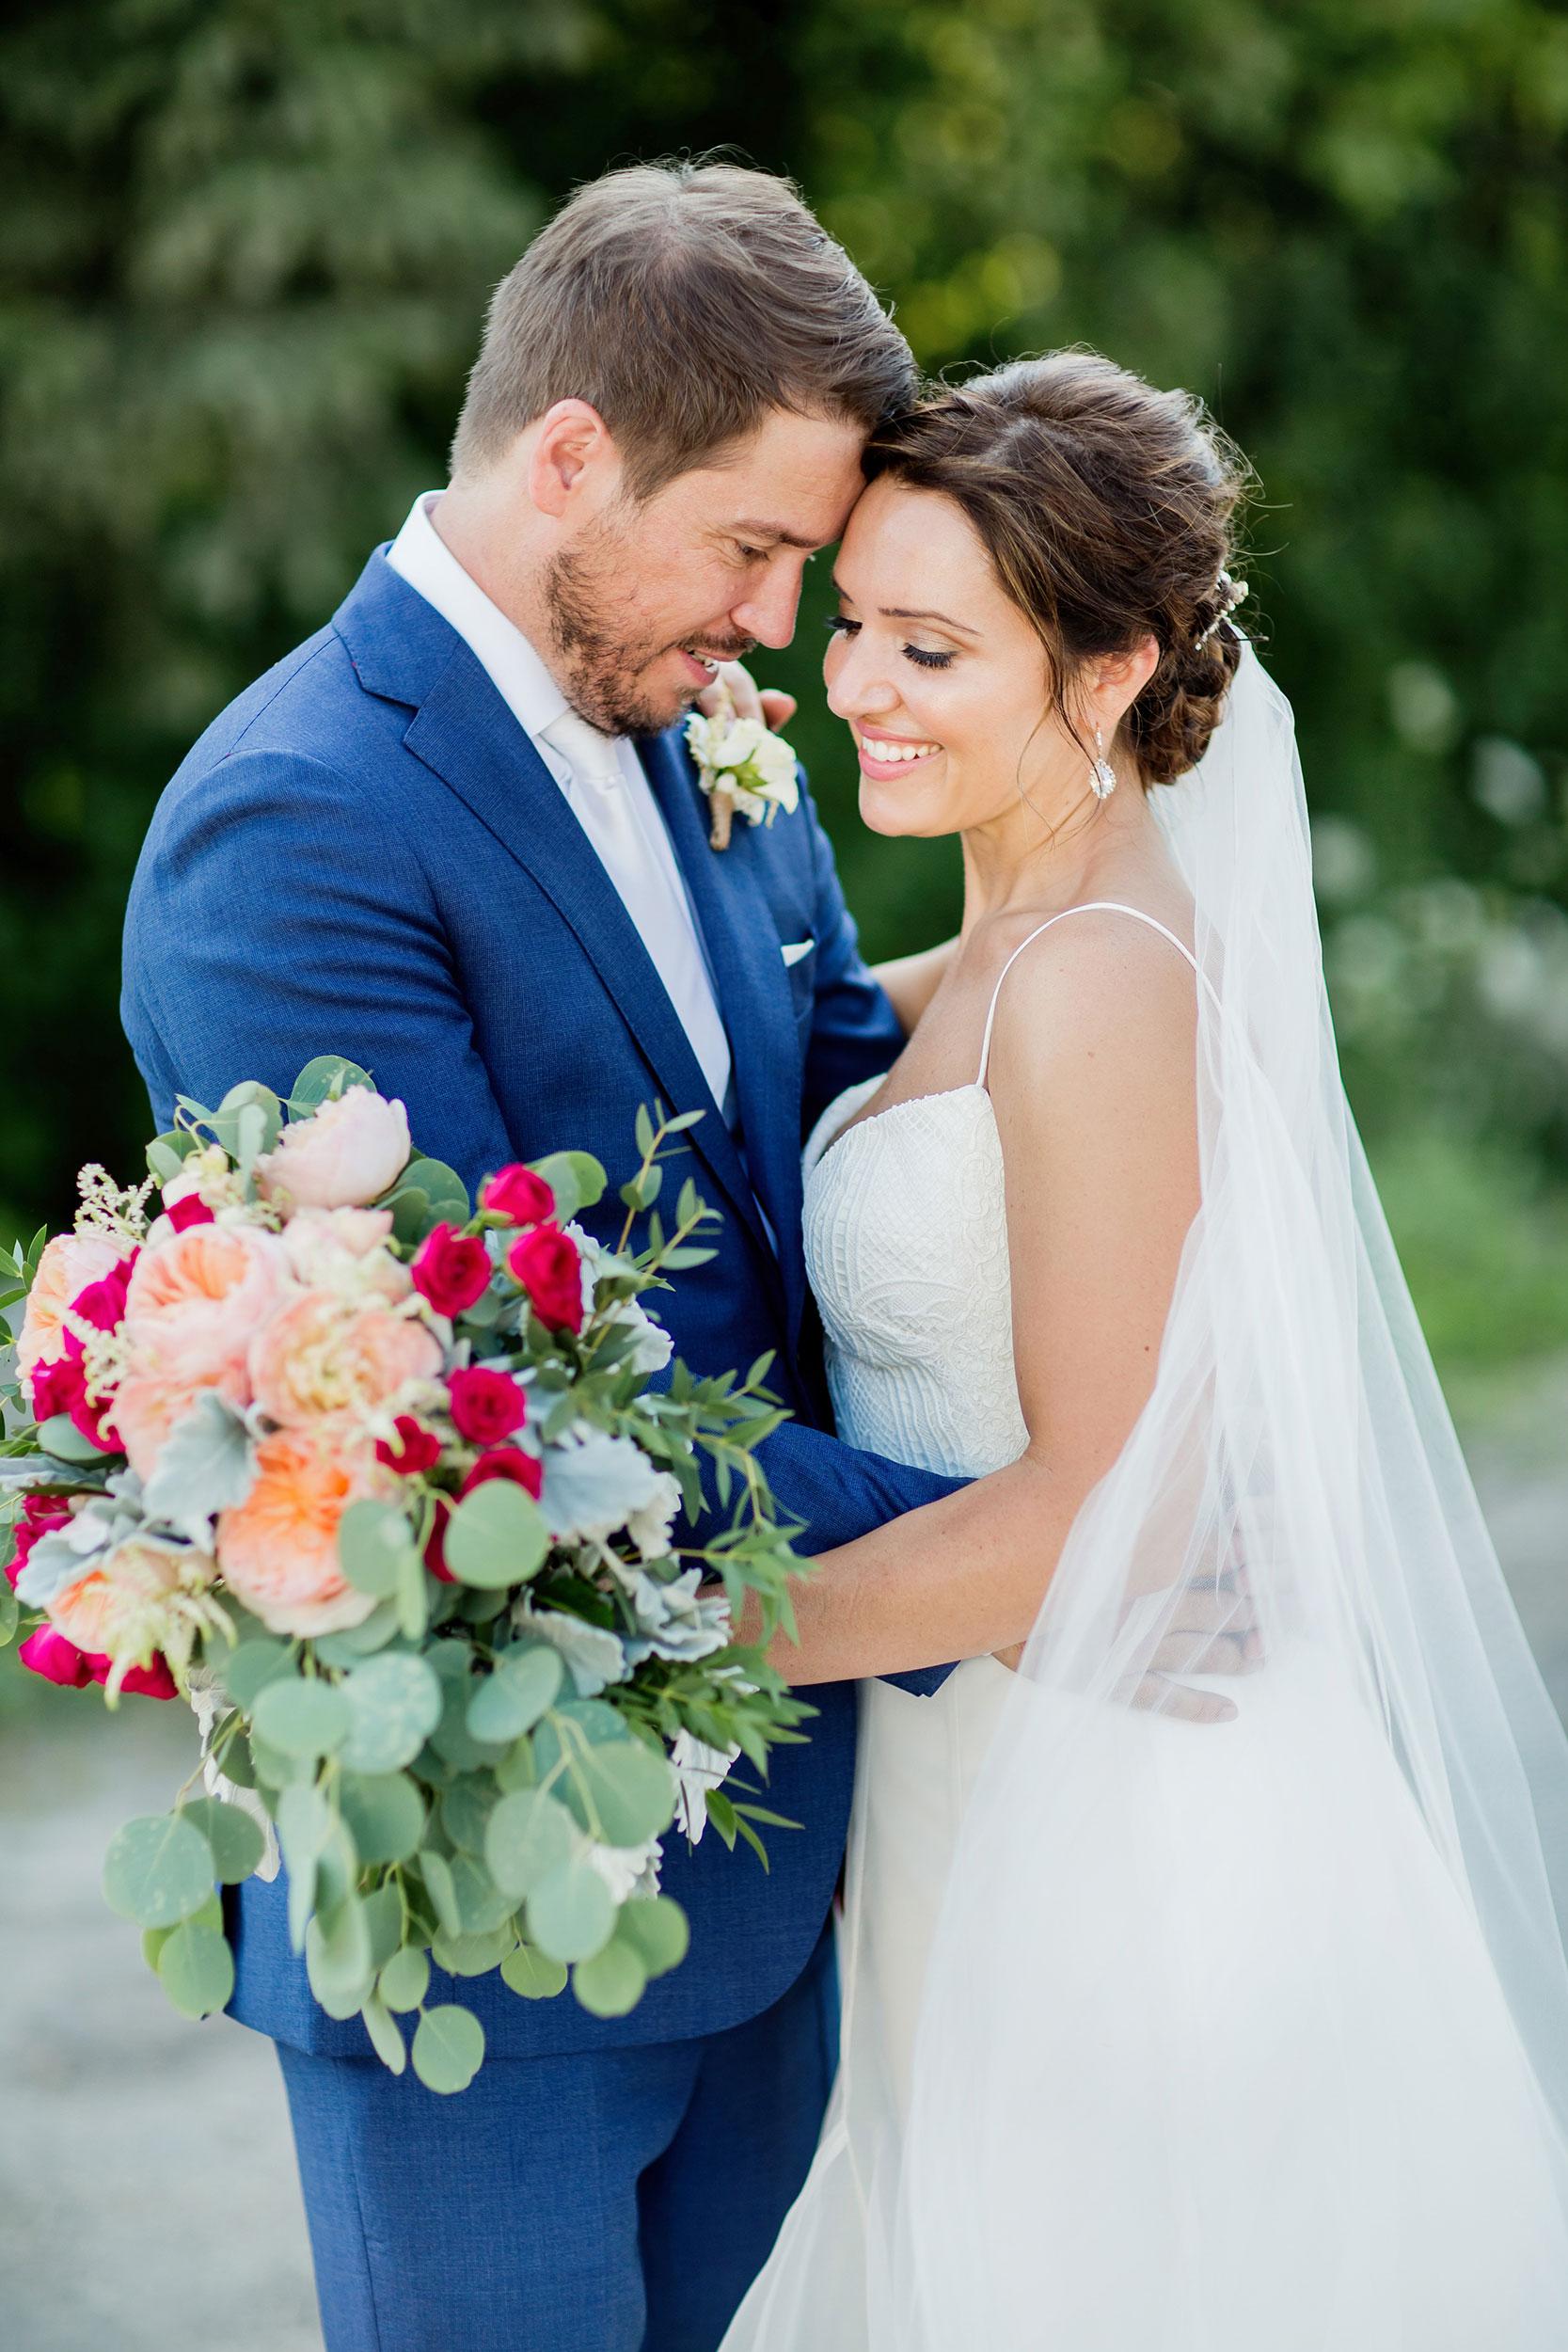 stylish-wedding-photography-windsor-toronto-ontario-wedding-photographer-sprucewood-winery-eryn-shea-photography-36.JPG